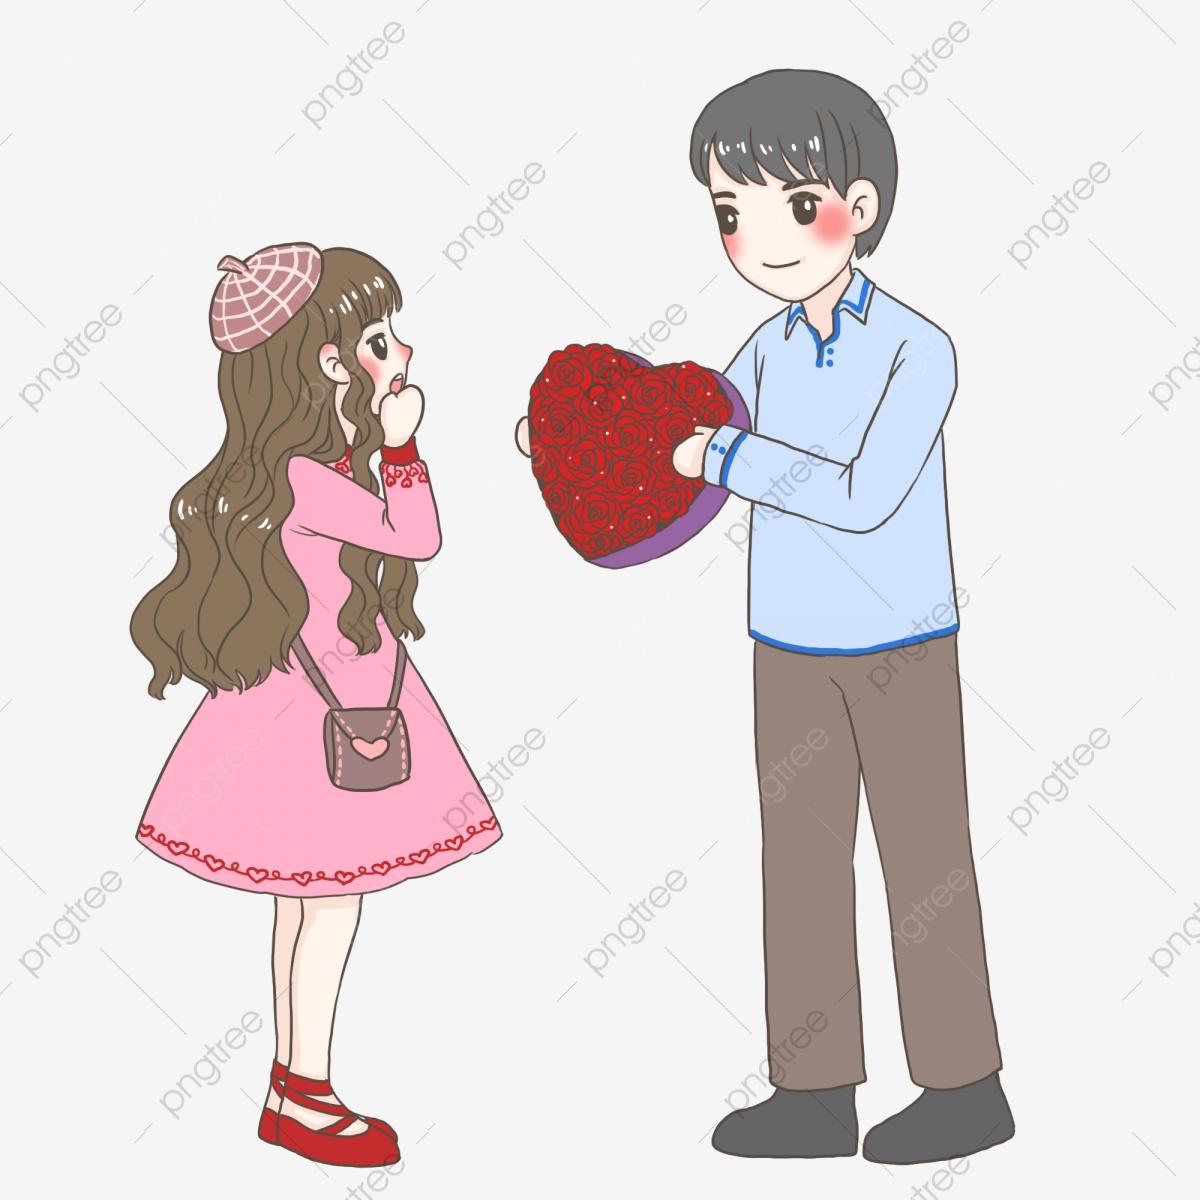 Lollipop clipart cute couple. Valentines day romantic intimate